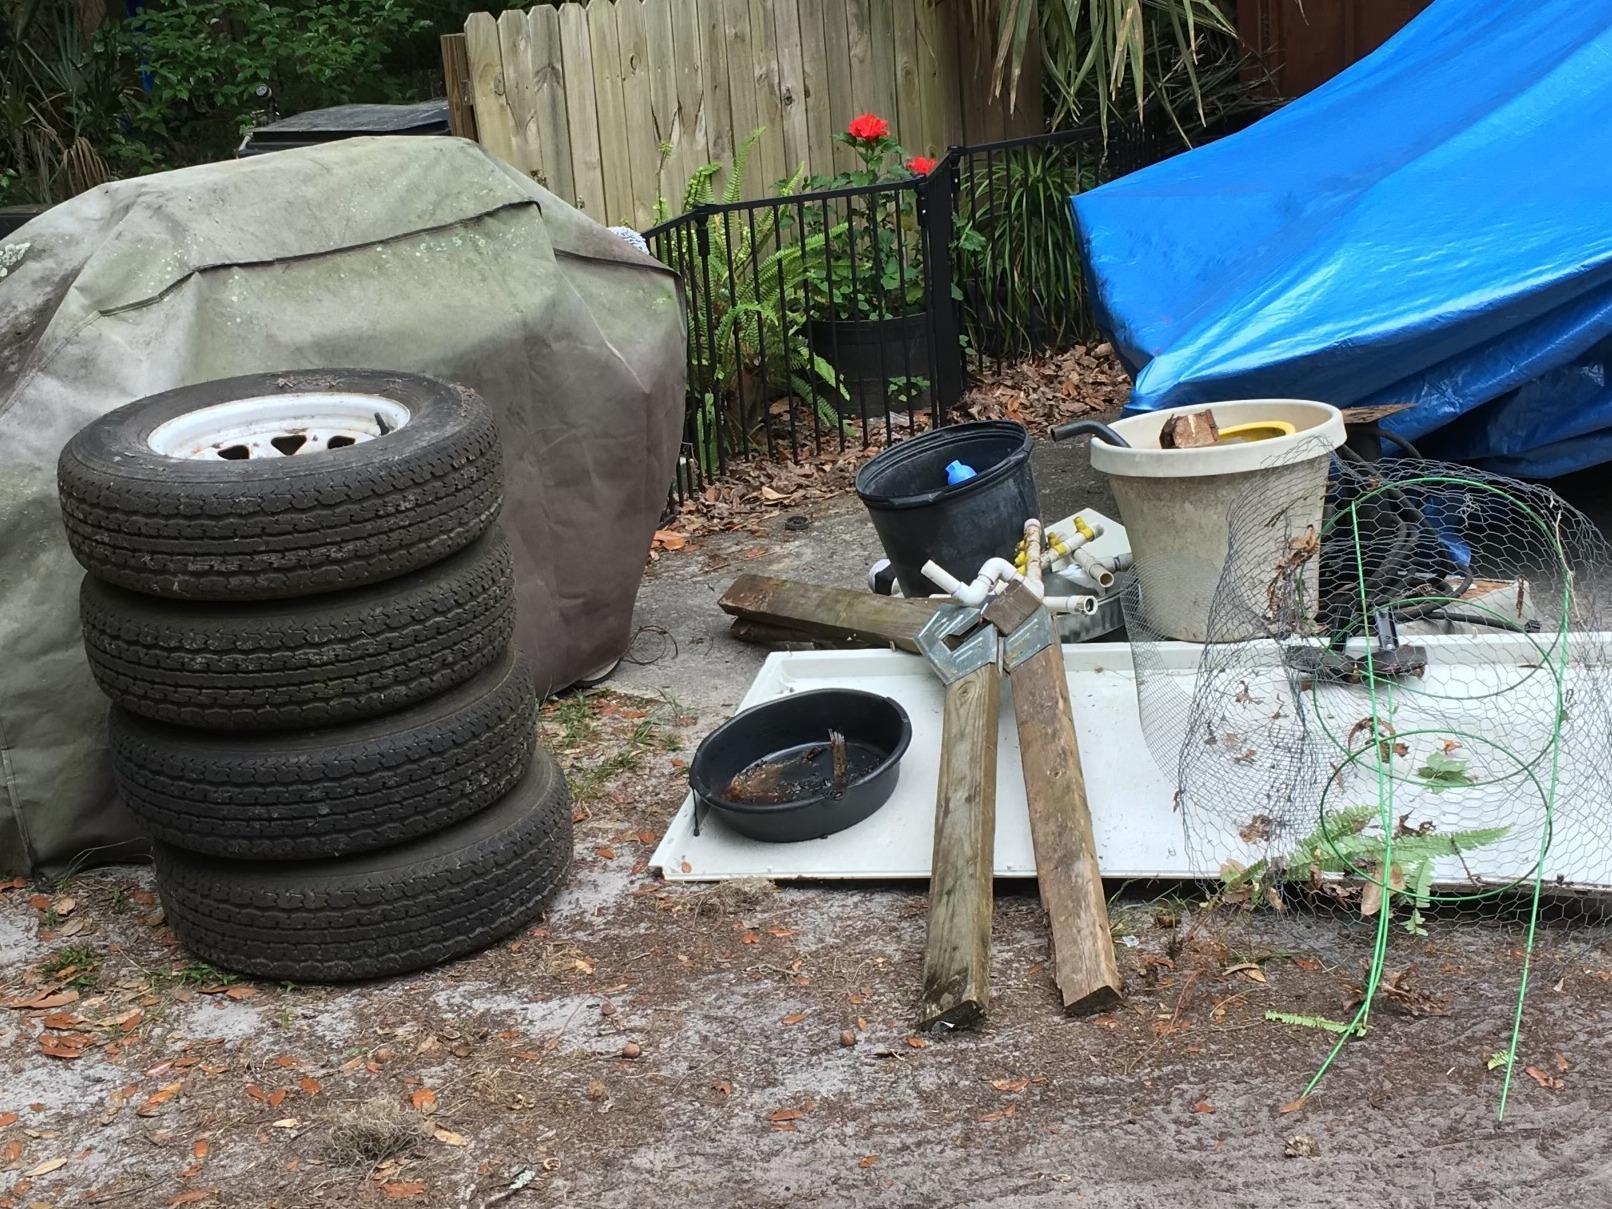 Yulee, Fl Yard junk removal - Before Photo